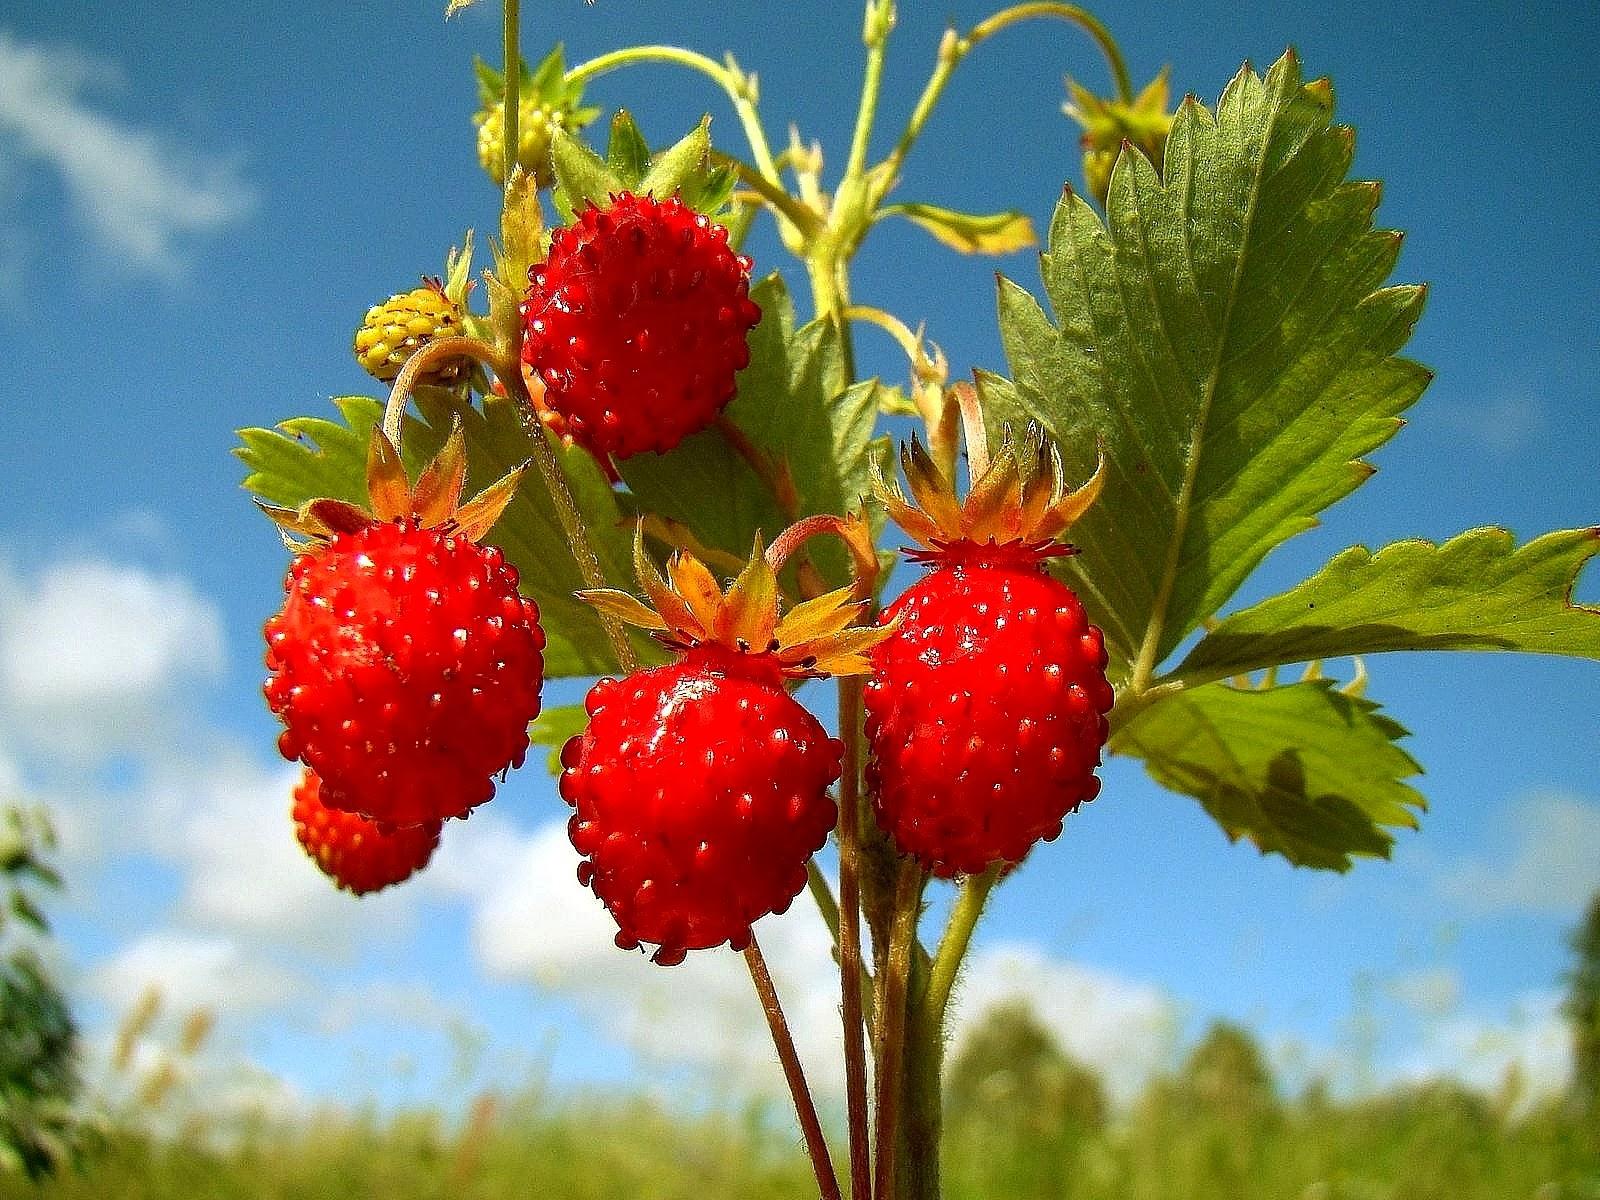 fruits tree wallpaper hd wwwimgkidcom the image kid